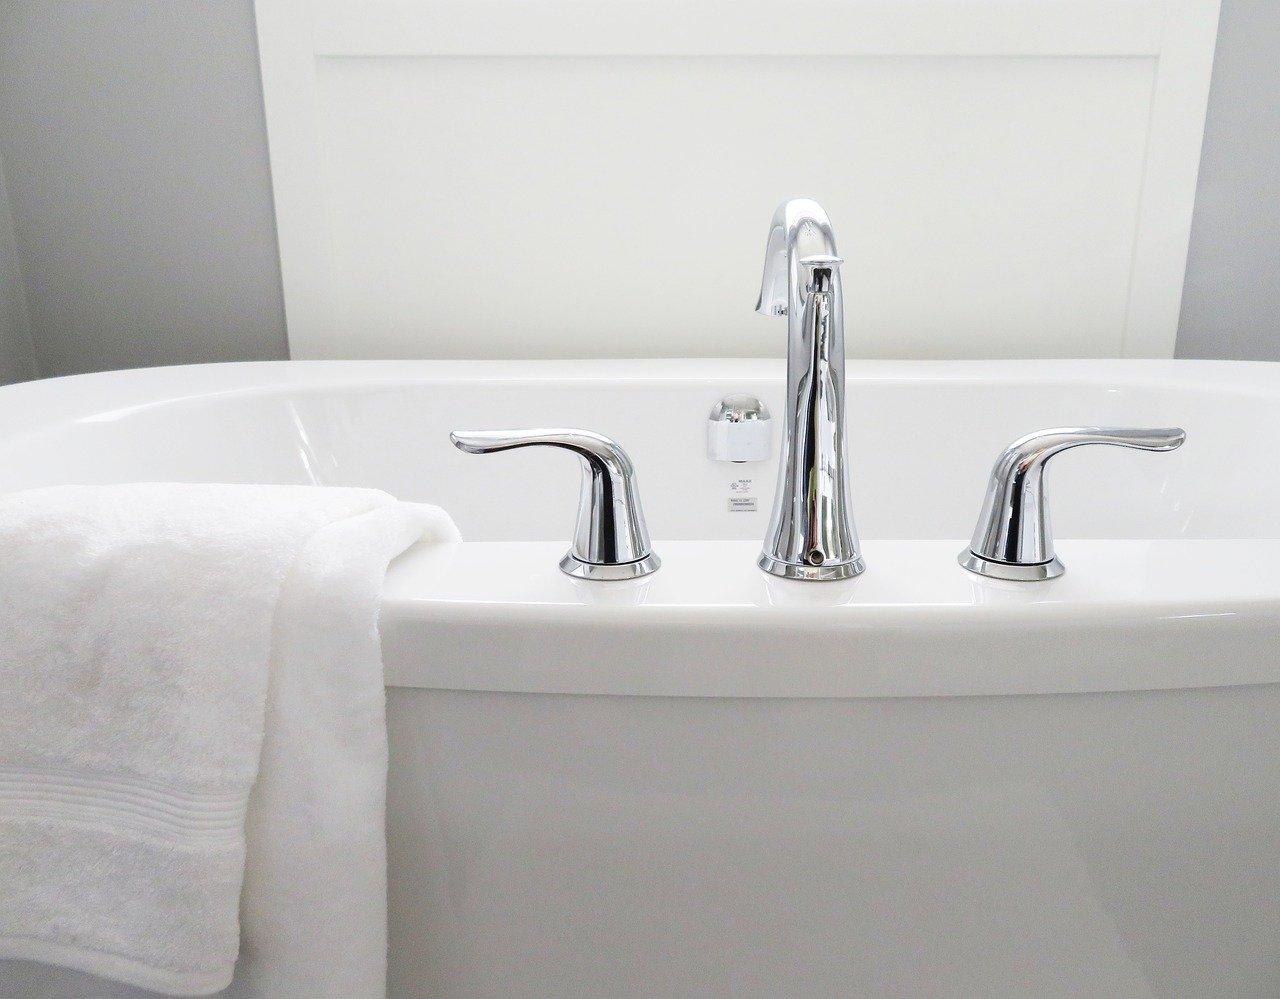 White Towel Draped Over Clean, White Bathub